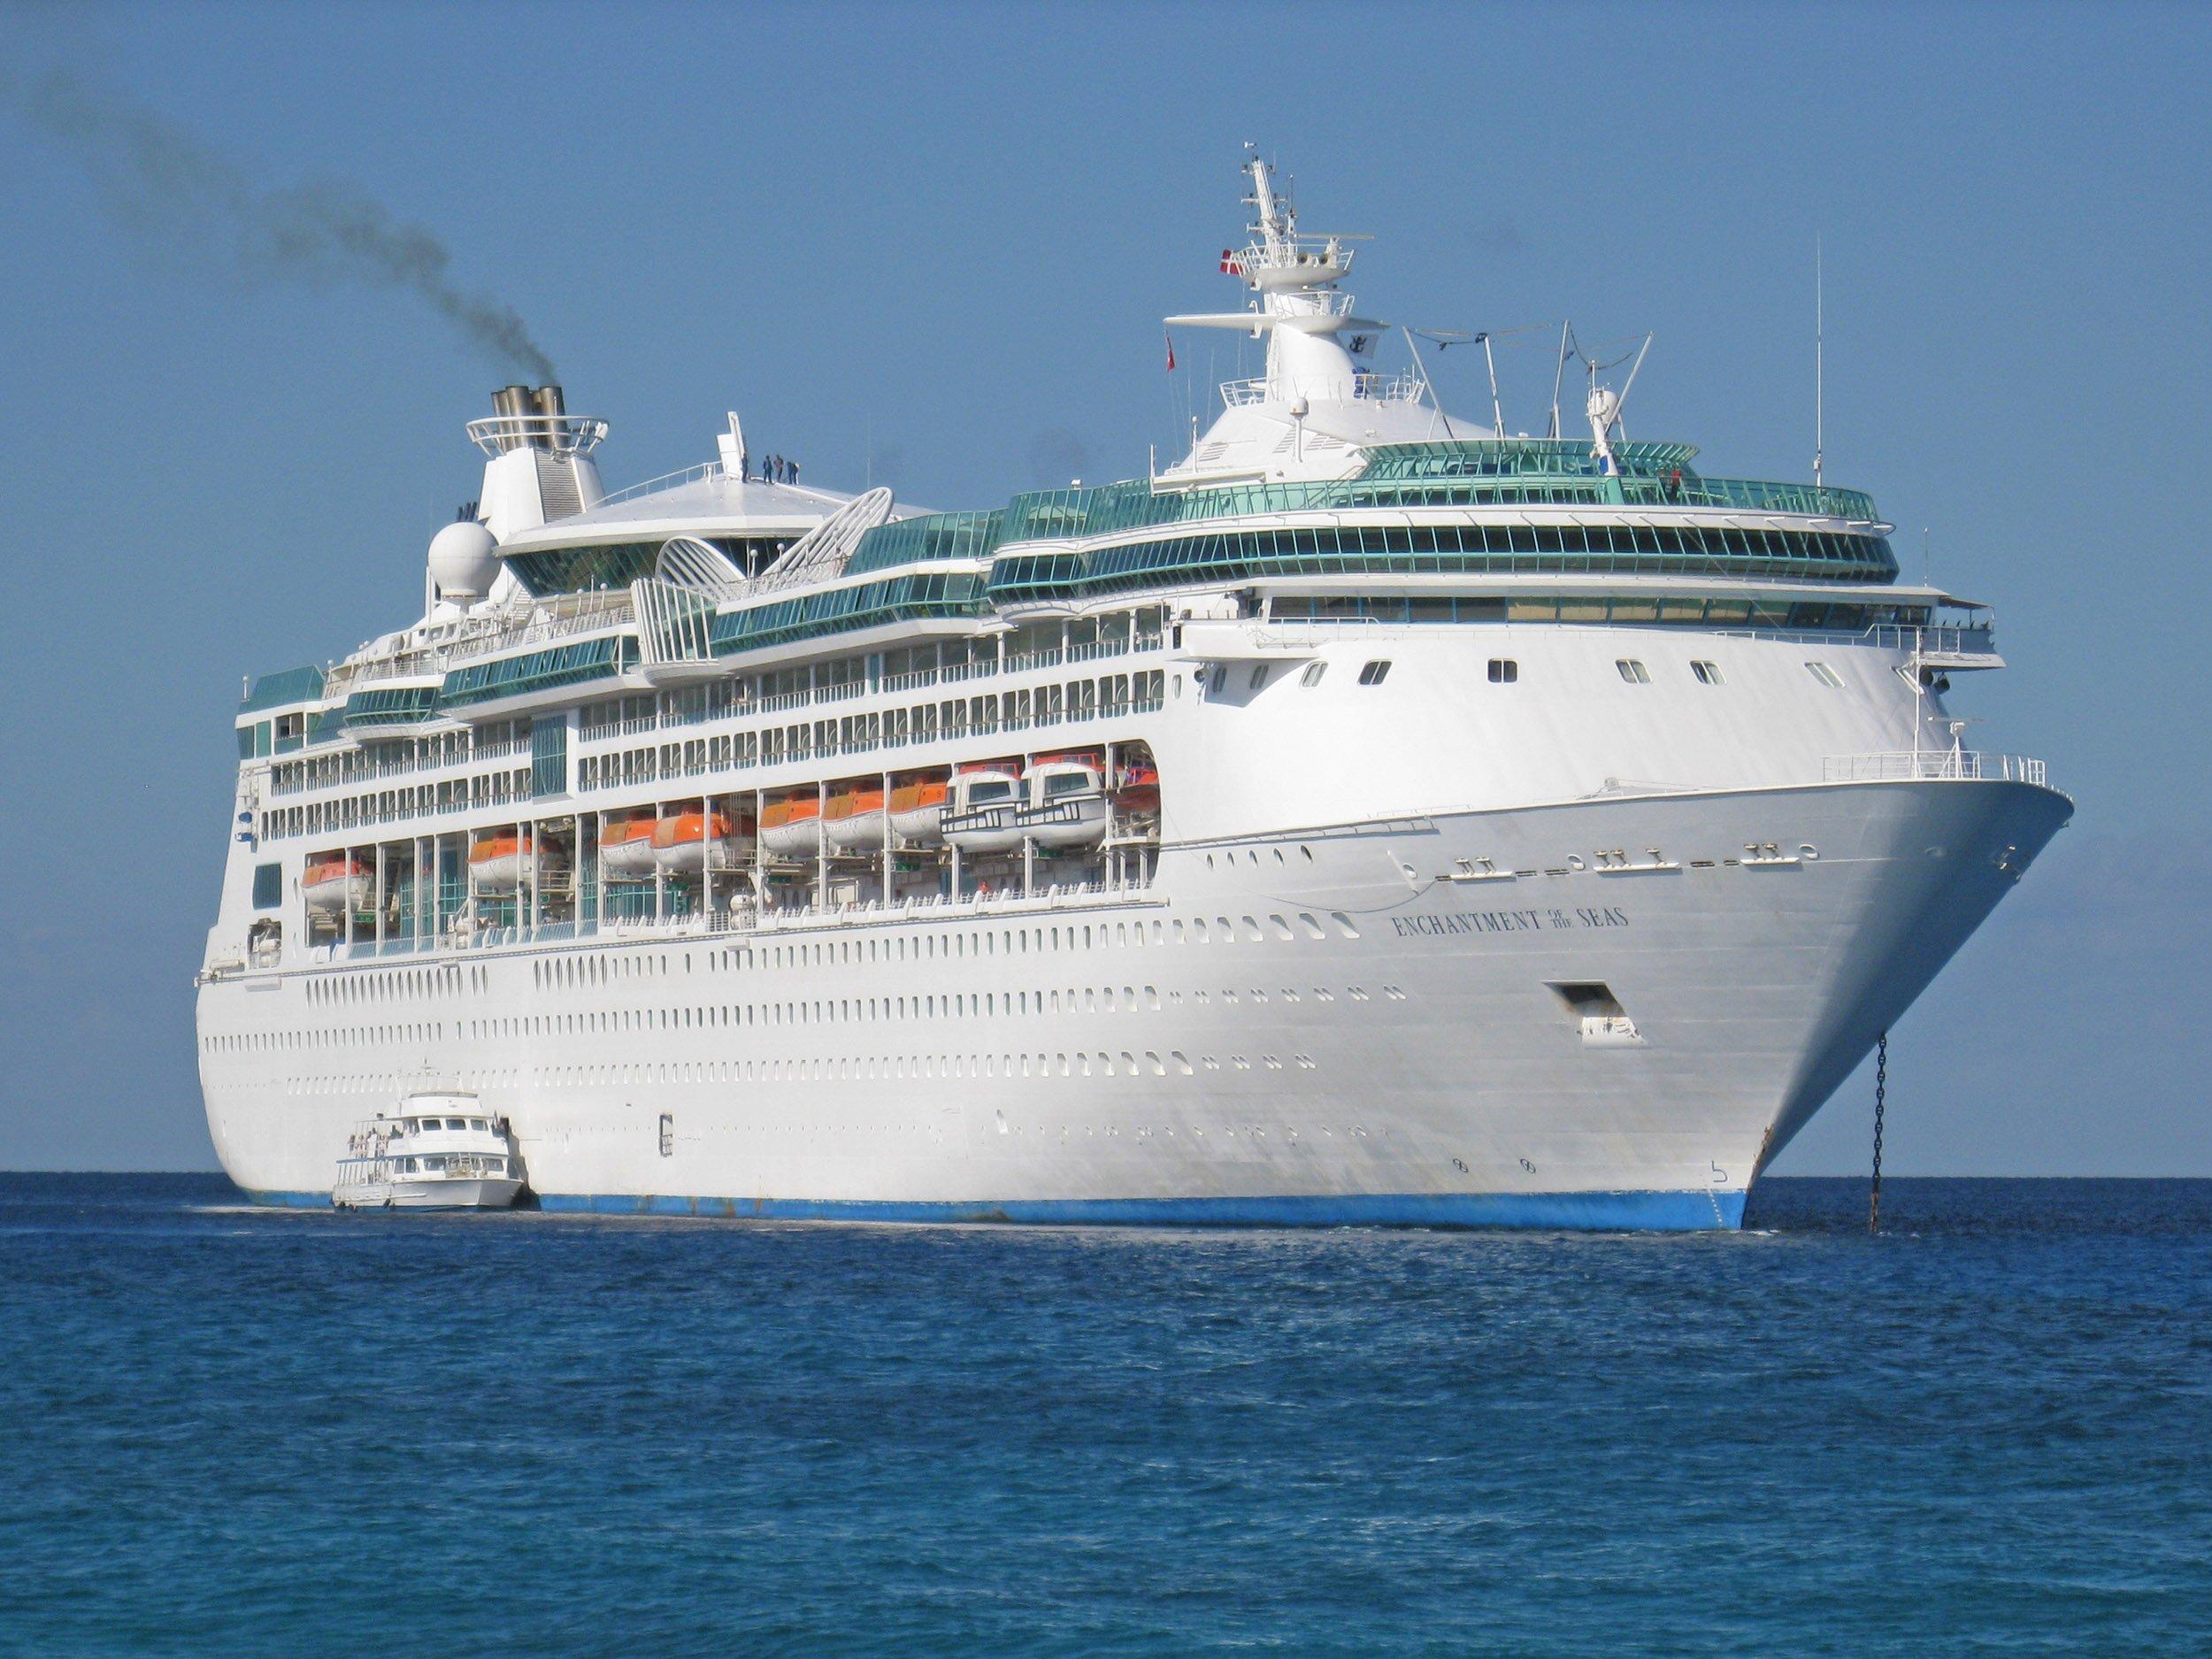 Royal Carribbean Cruise